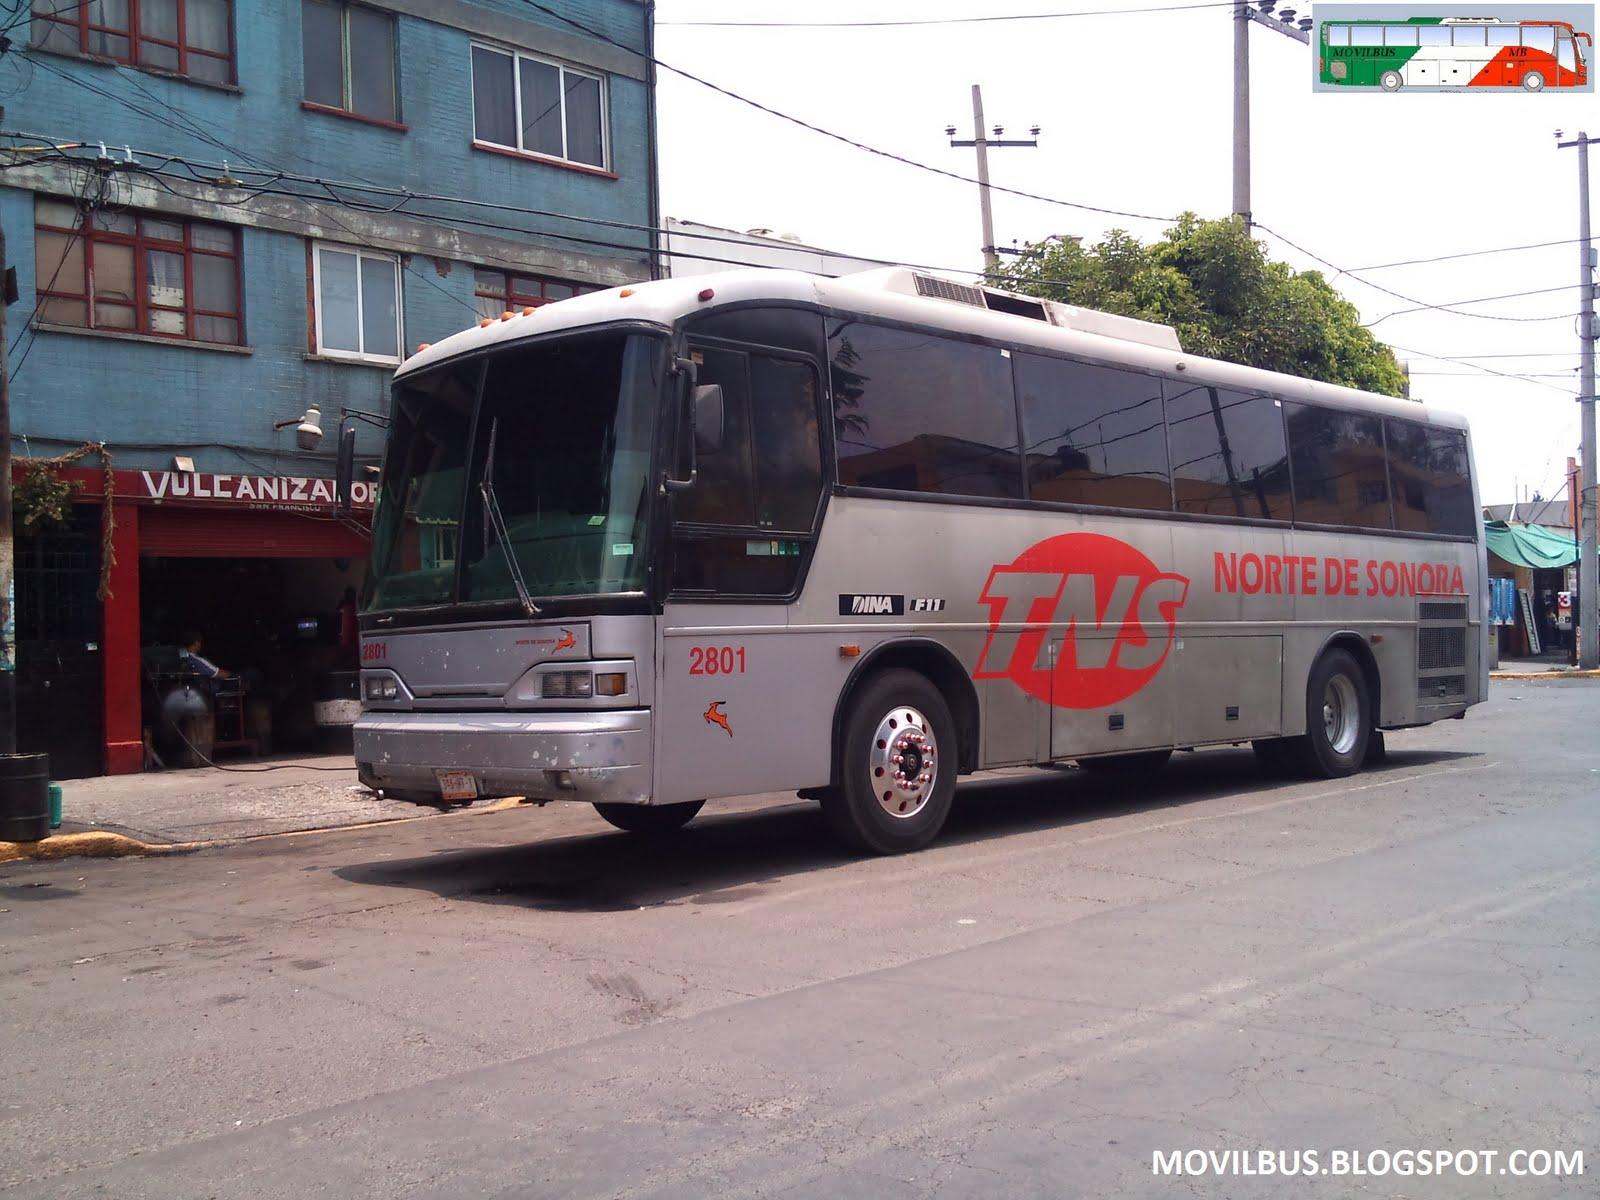 Movilbus mci dina f 11 transportes norte de sonora - Autobuses larga distancia ...